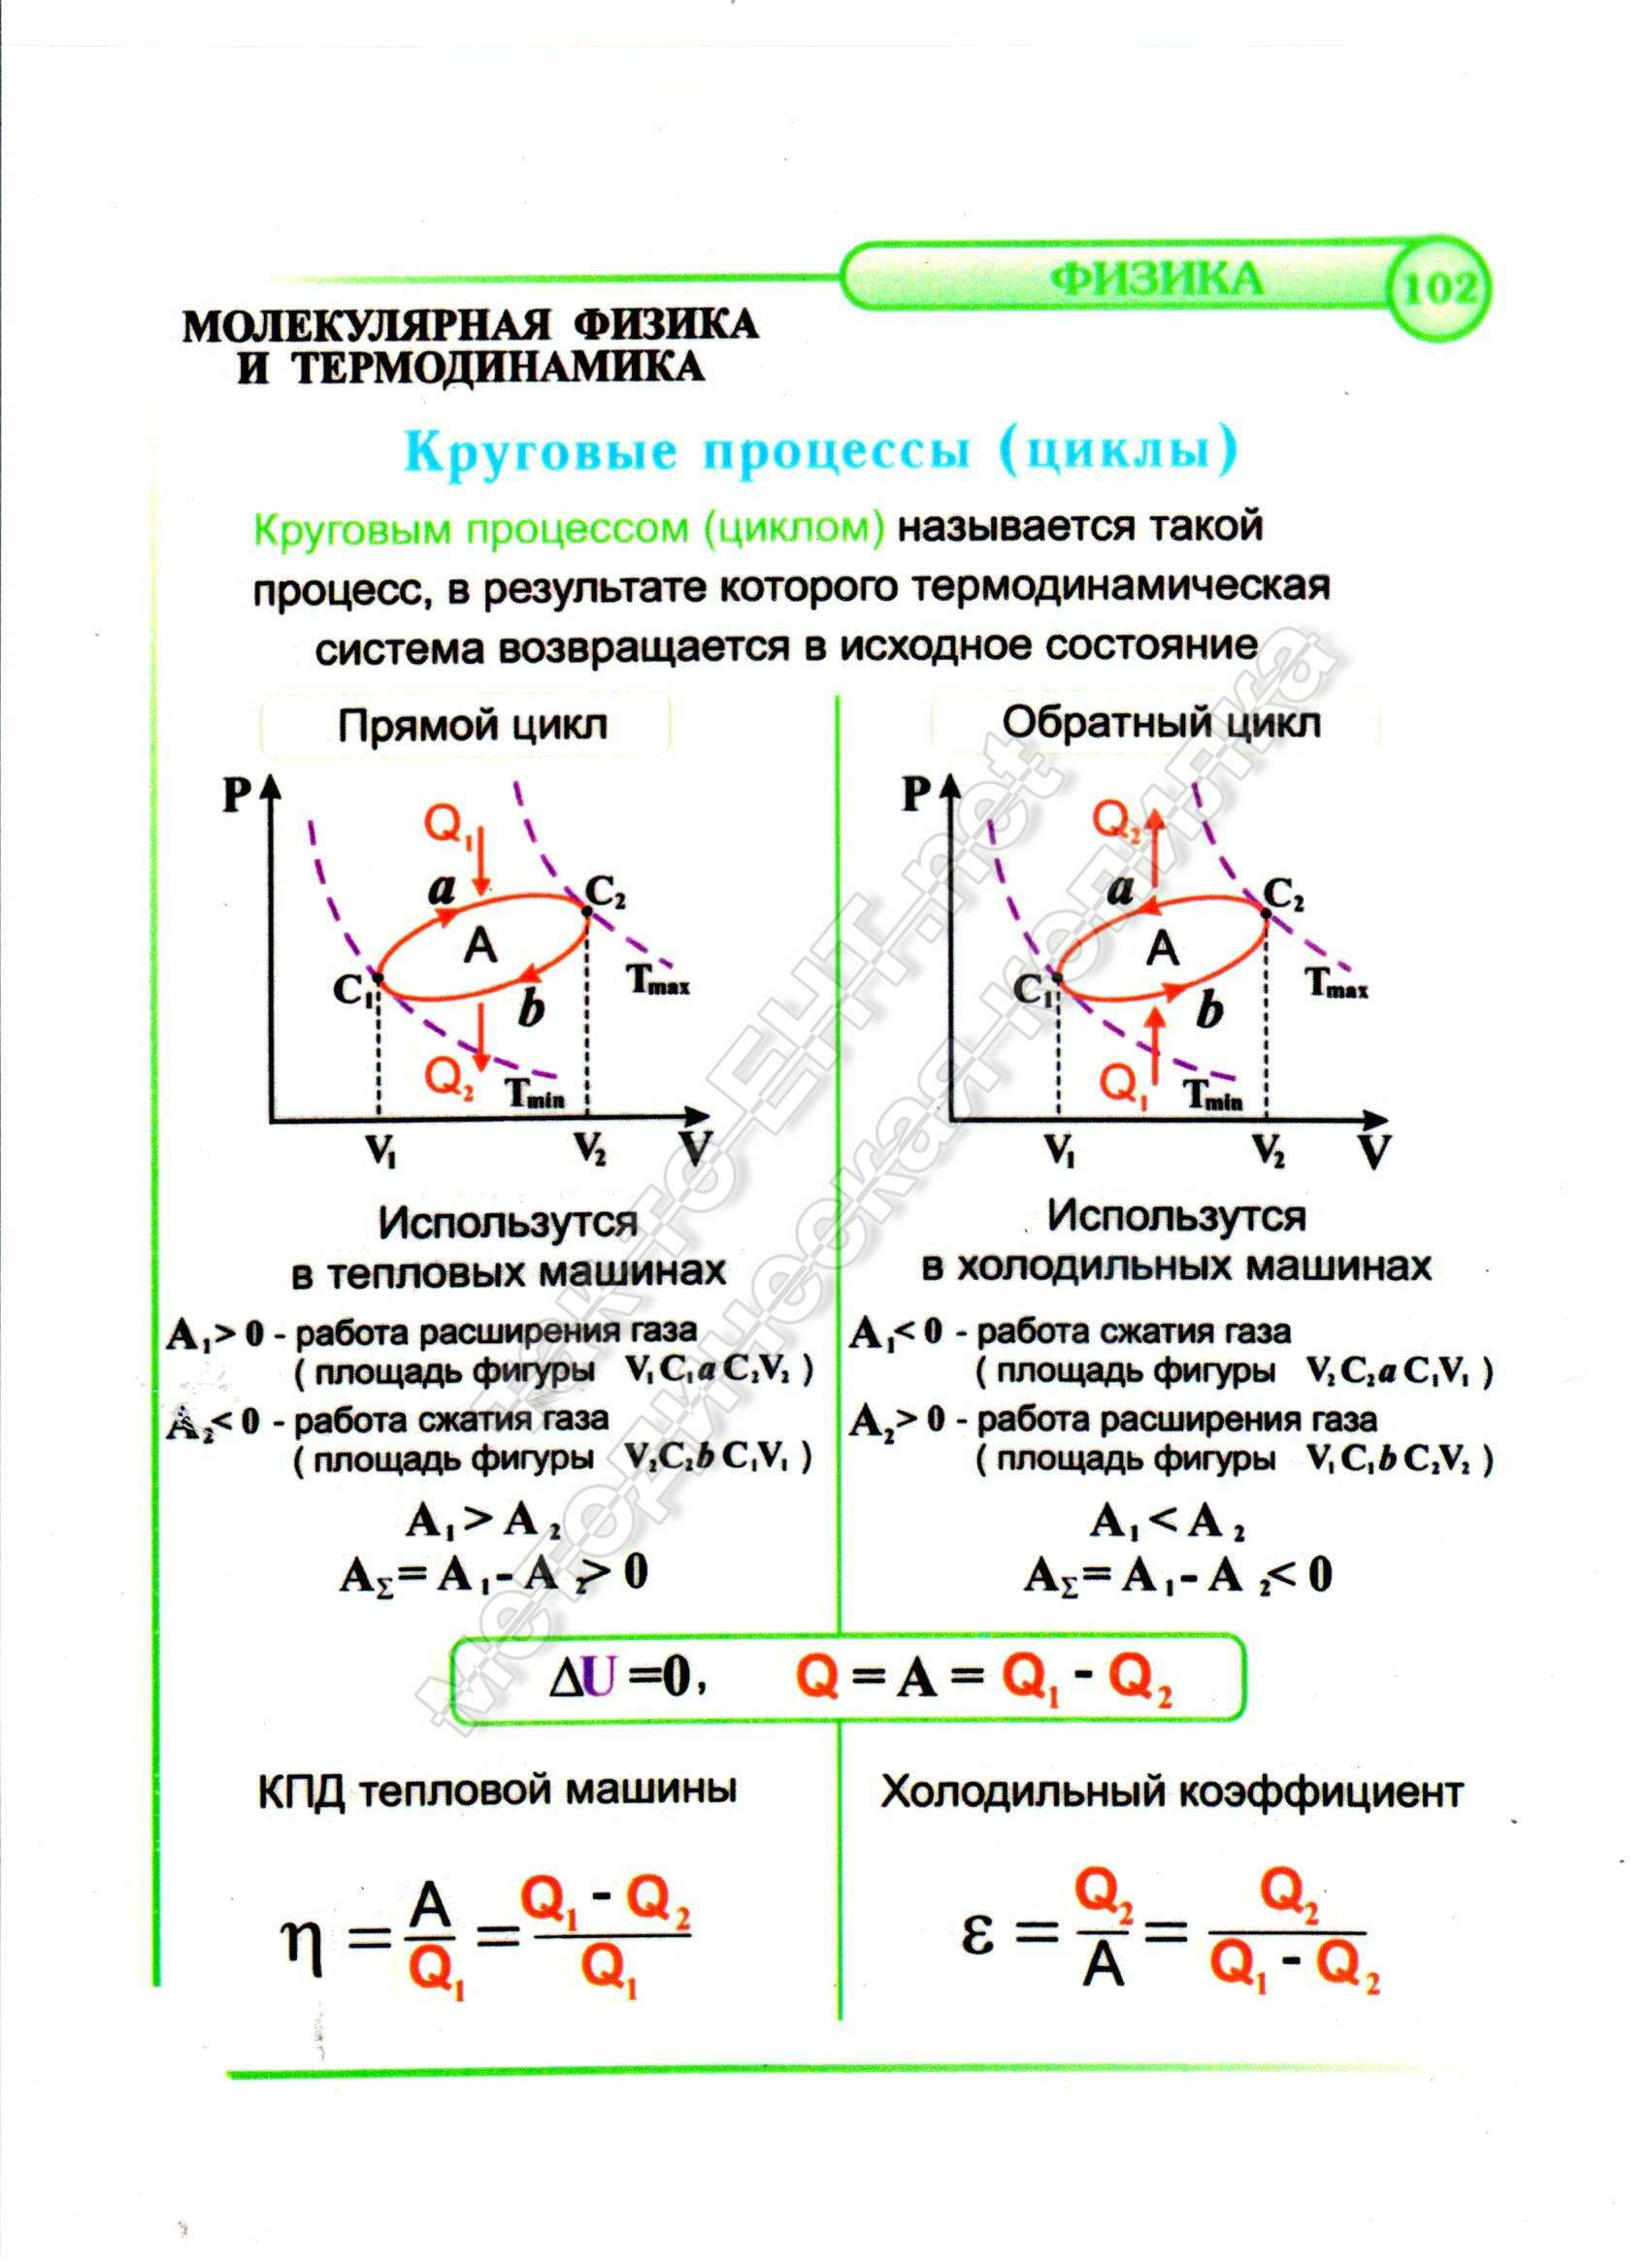 Круговые процессы (циклы)